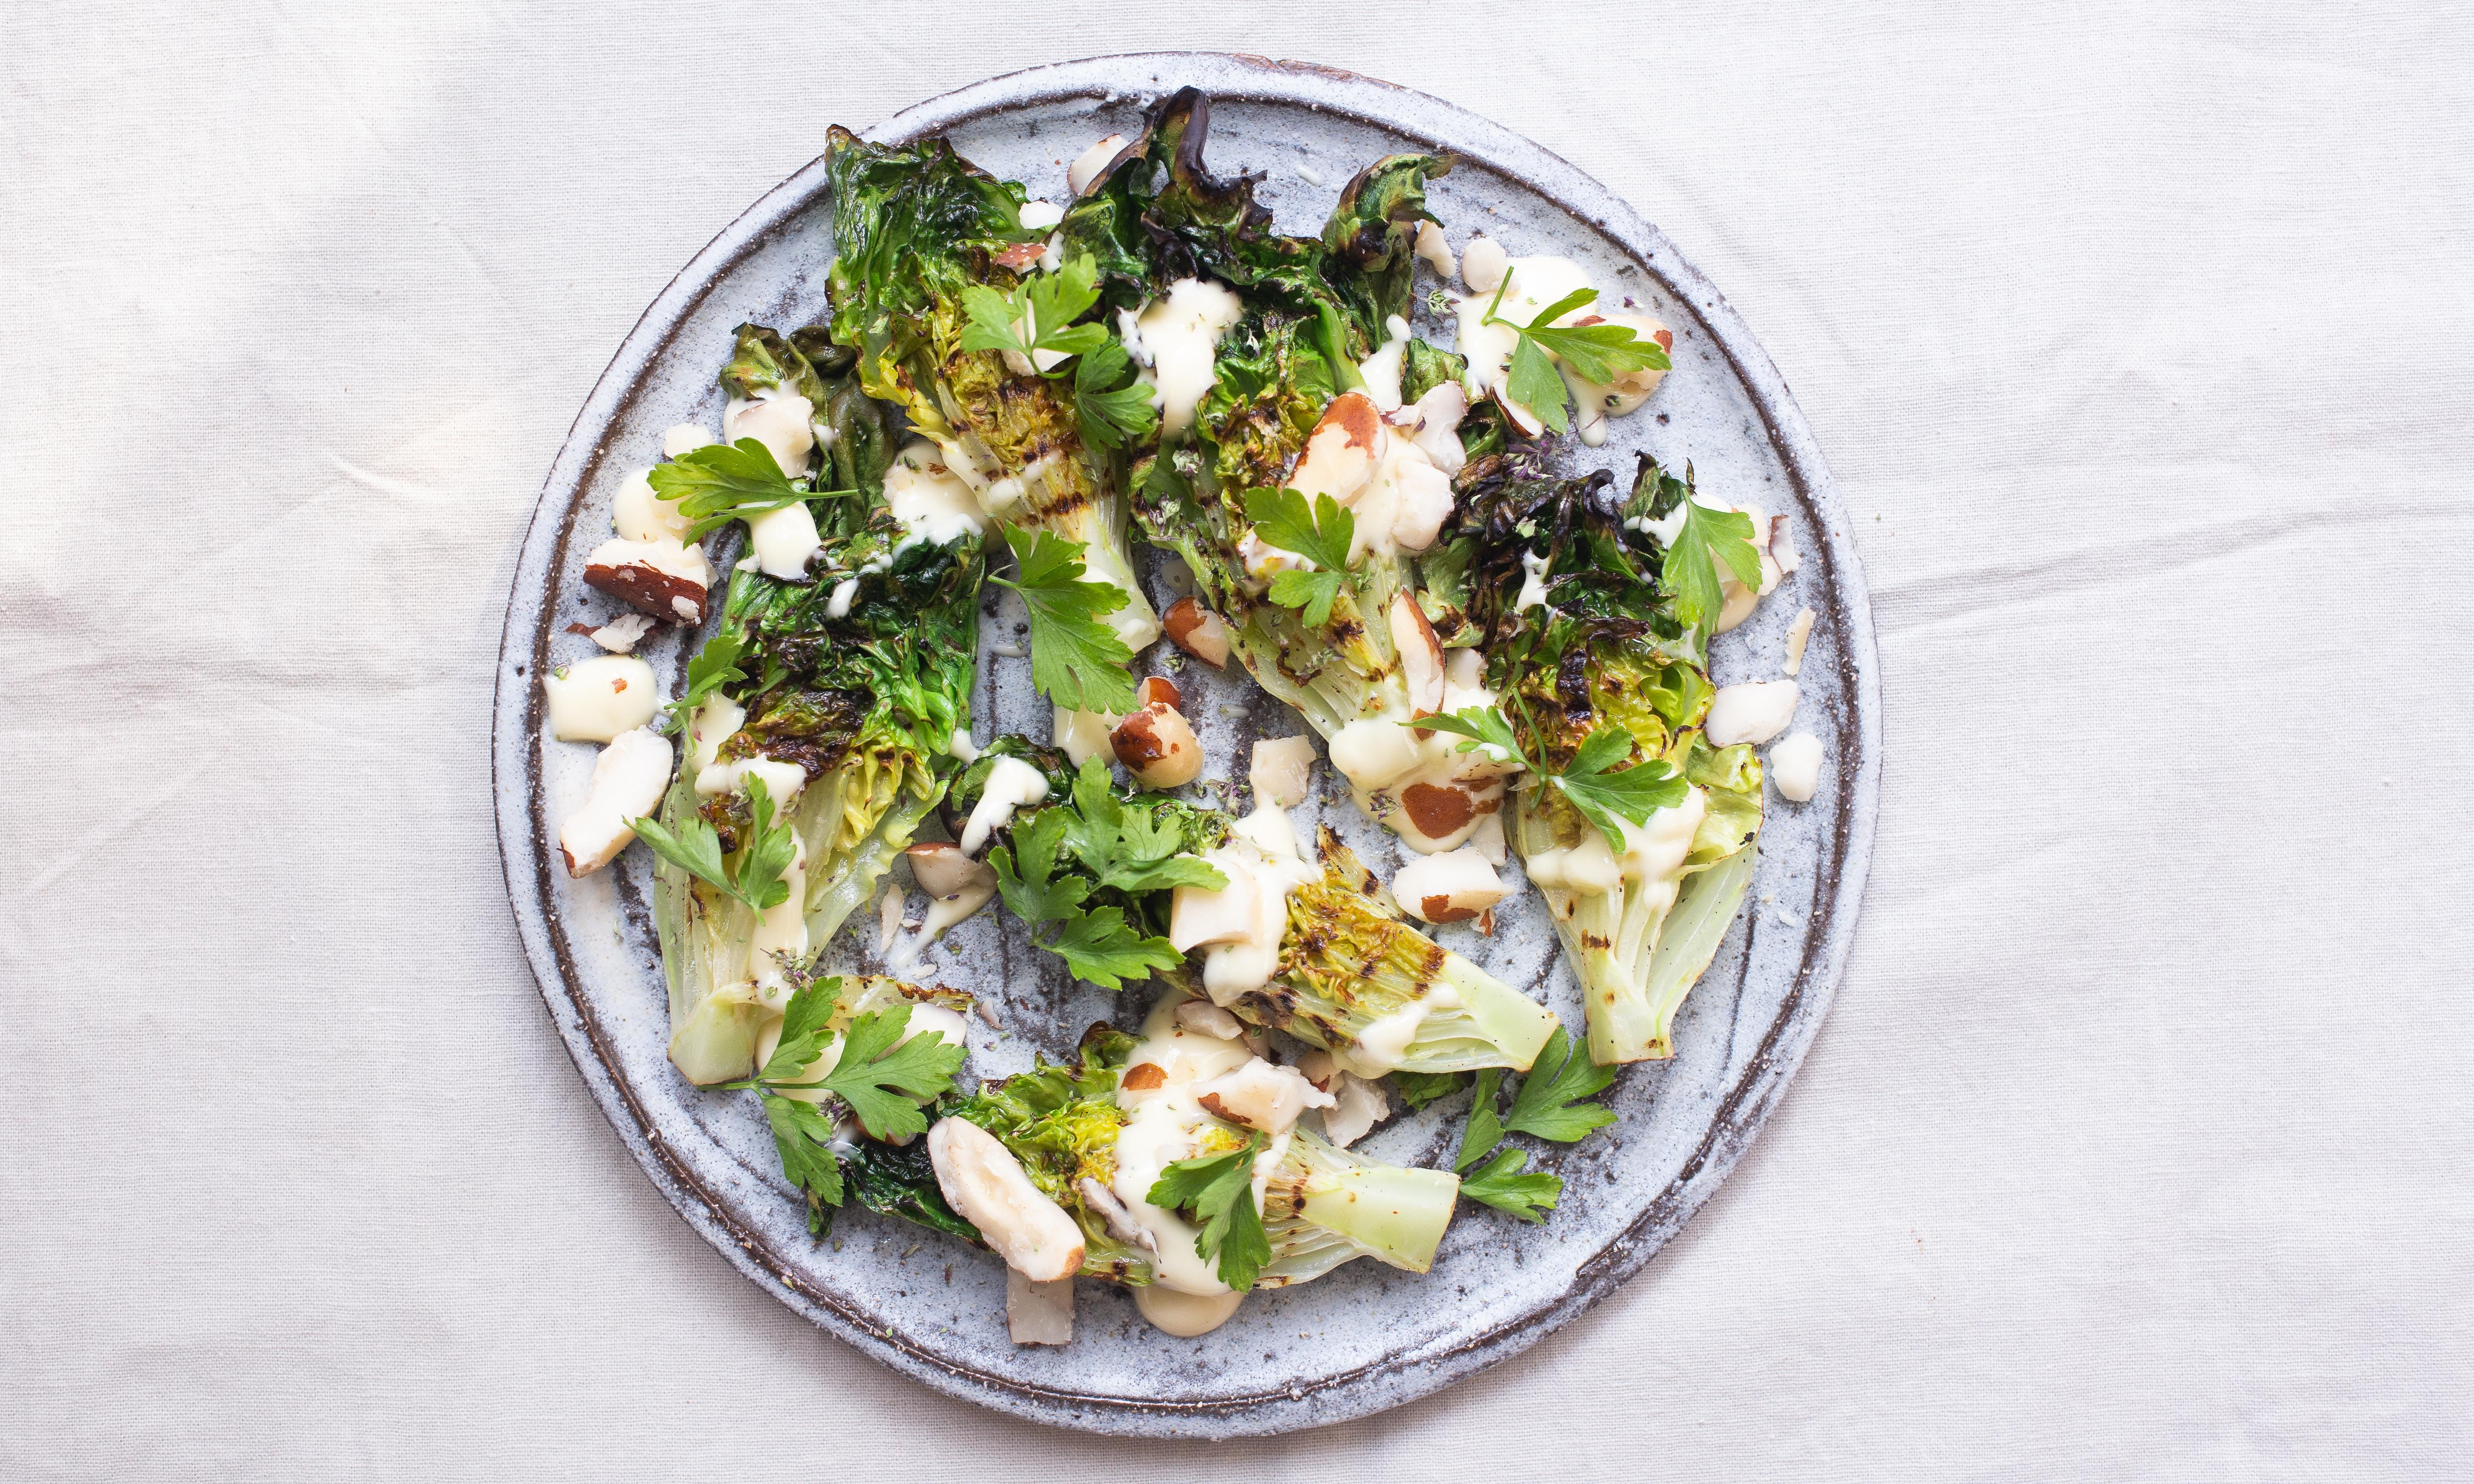 Don't bin limp lettuce – barbecue it instead